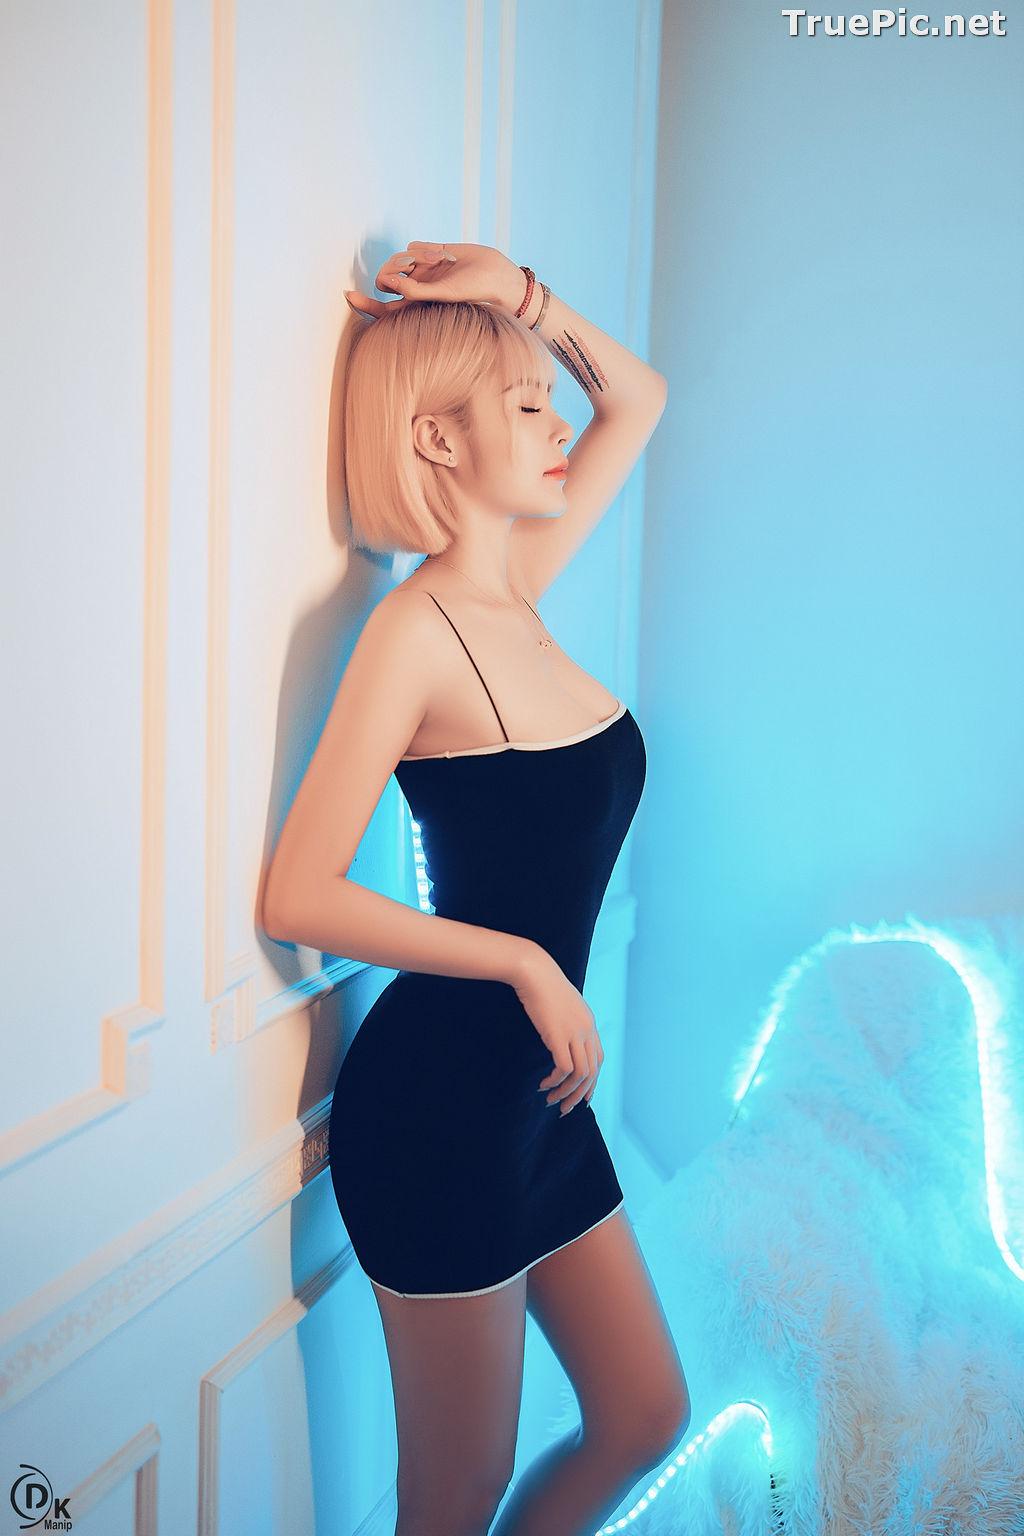 Image Vietnamese Model - Beautiful Short Hair Girl In Black Bodycon Dress - TruePic.net - Picture-1